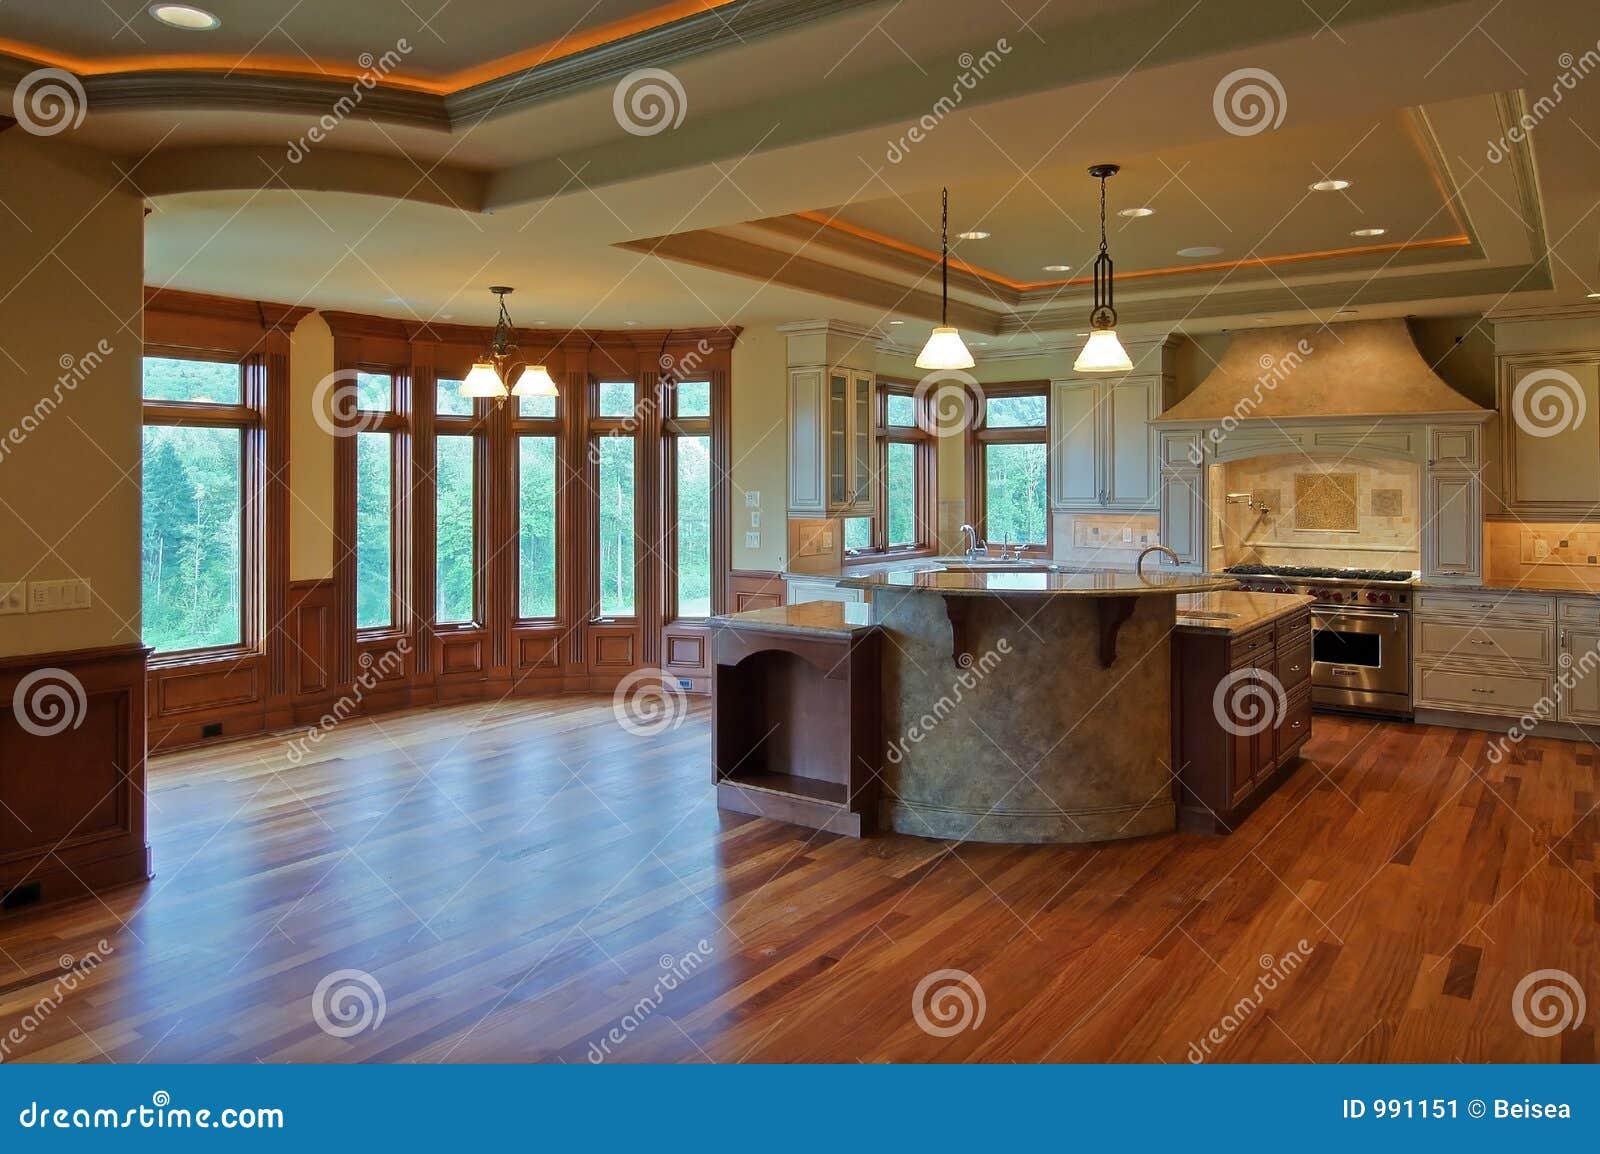 Cucina Di Lusso Immagine Stock - Immagine: 991151